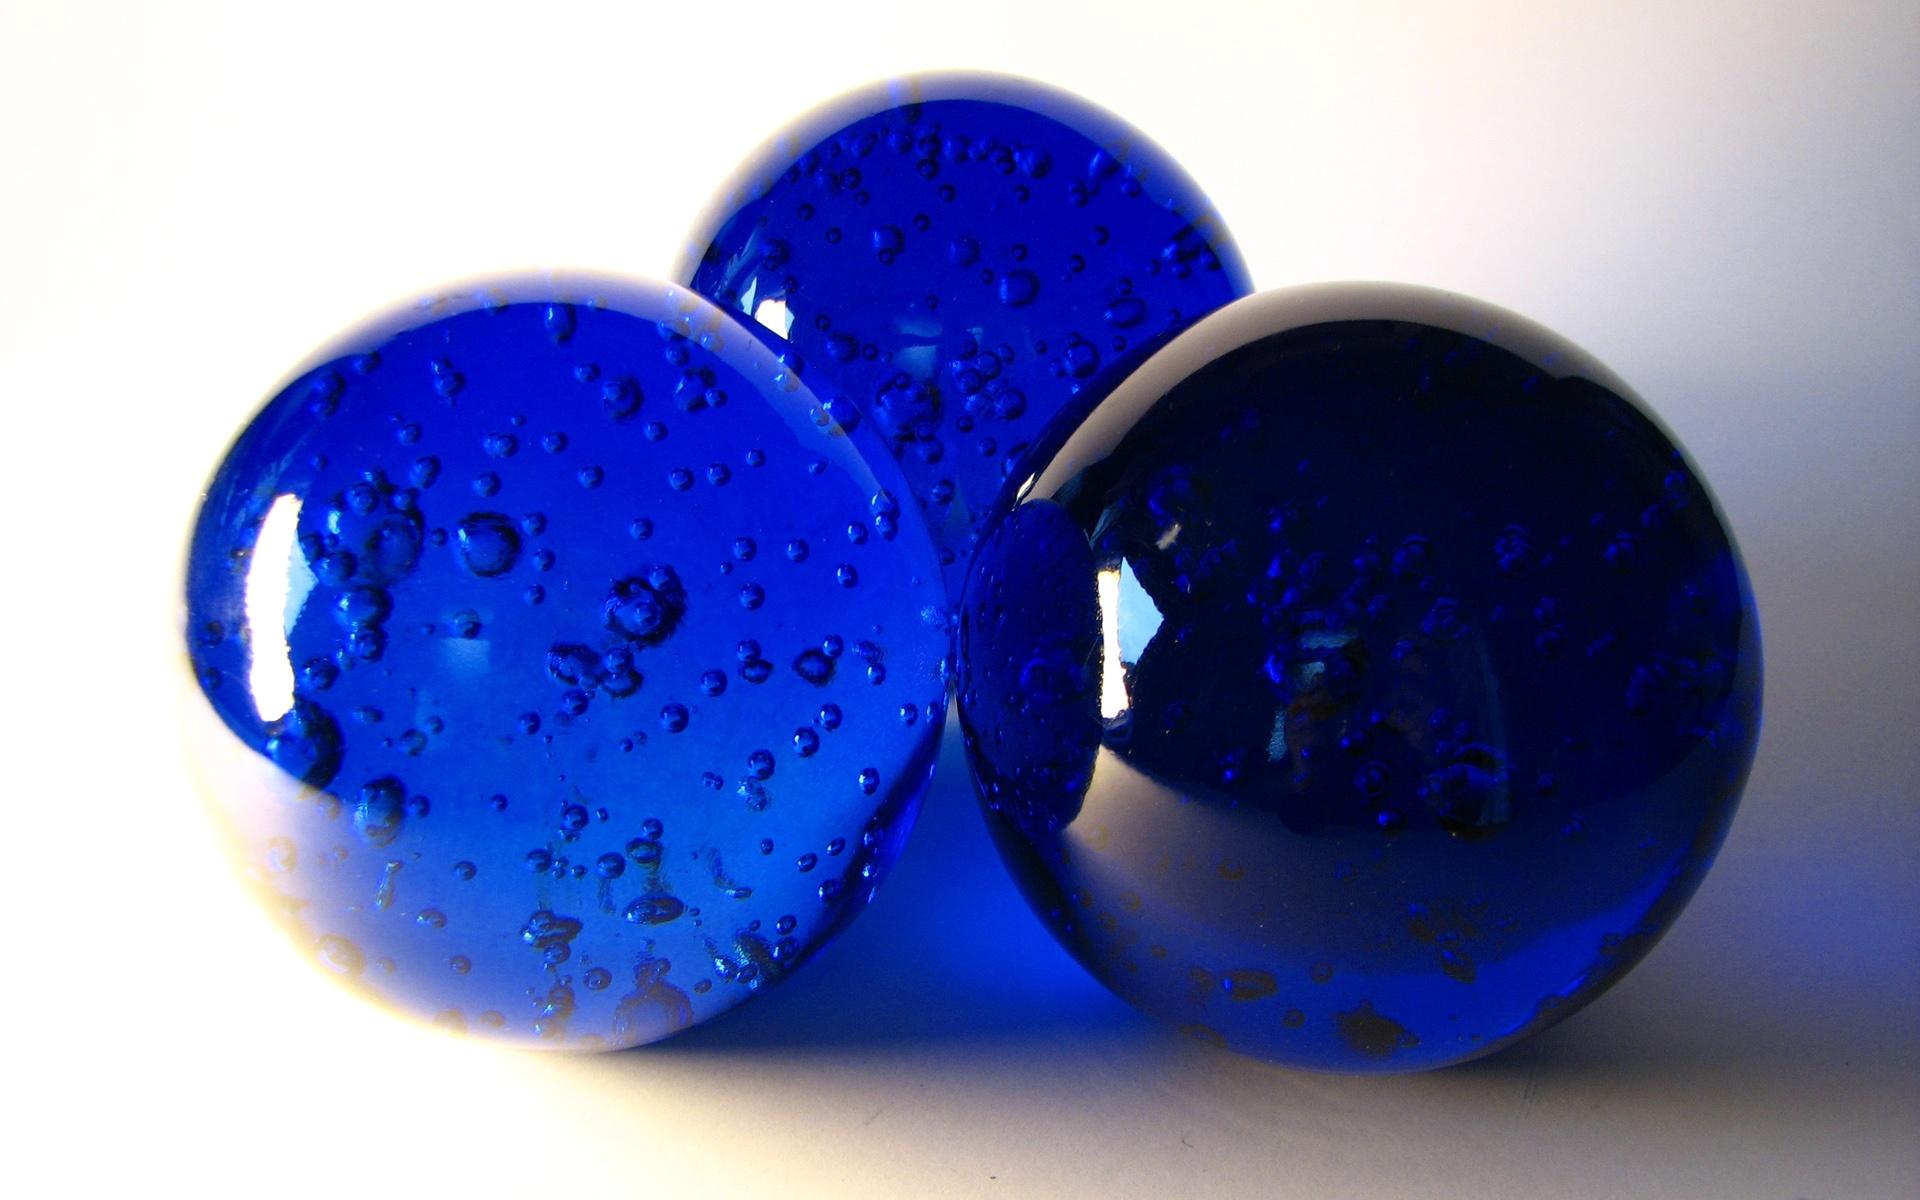 Glass Wallpaper Hd Blue Spheres Wallpapers 1920x1200 481745